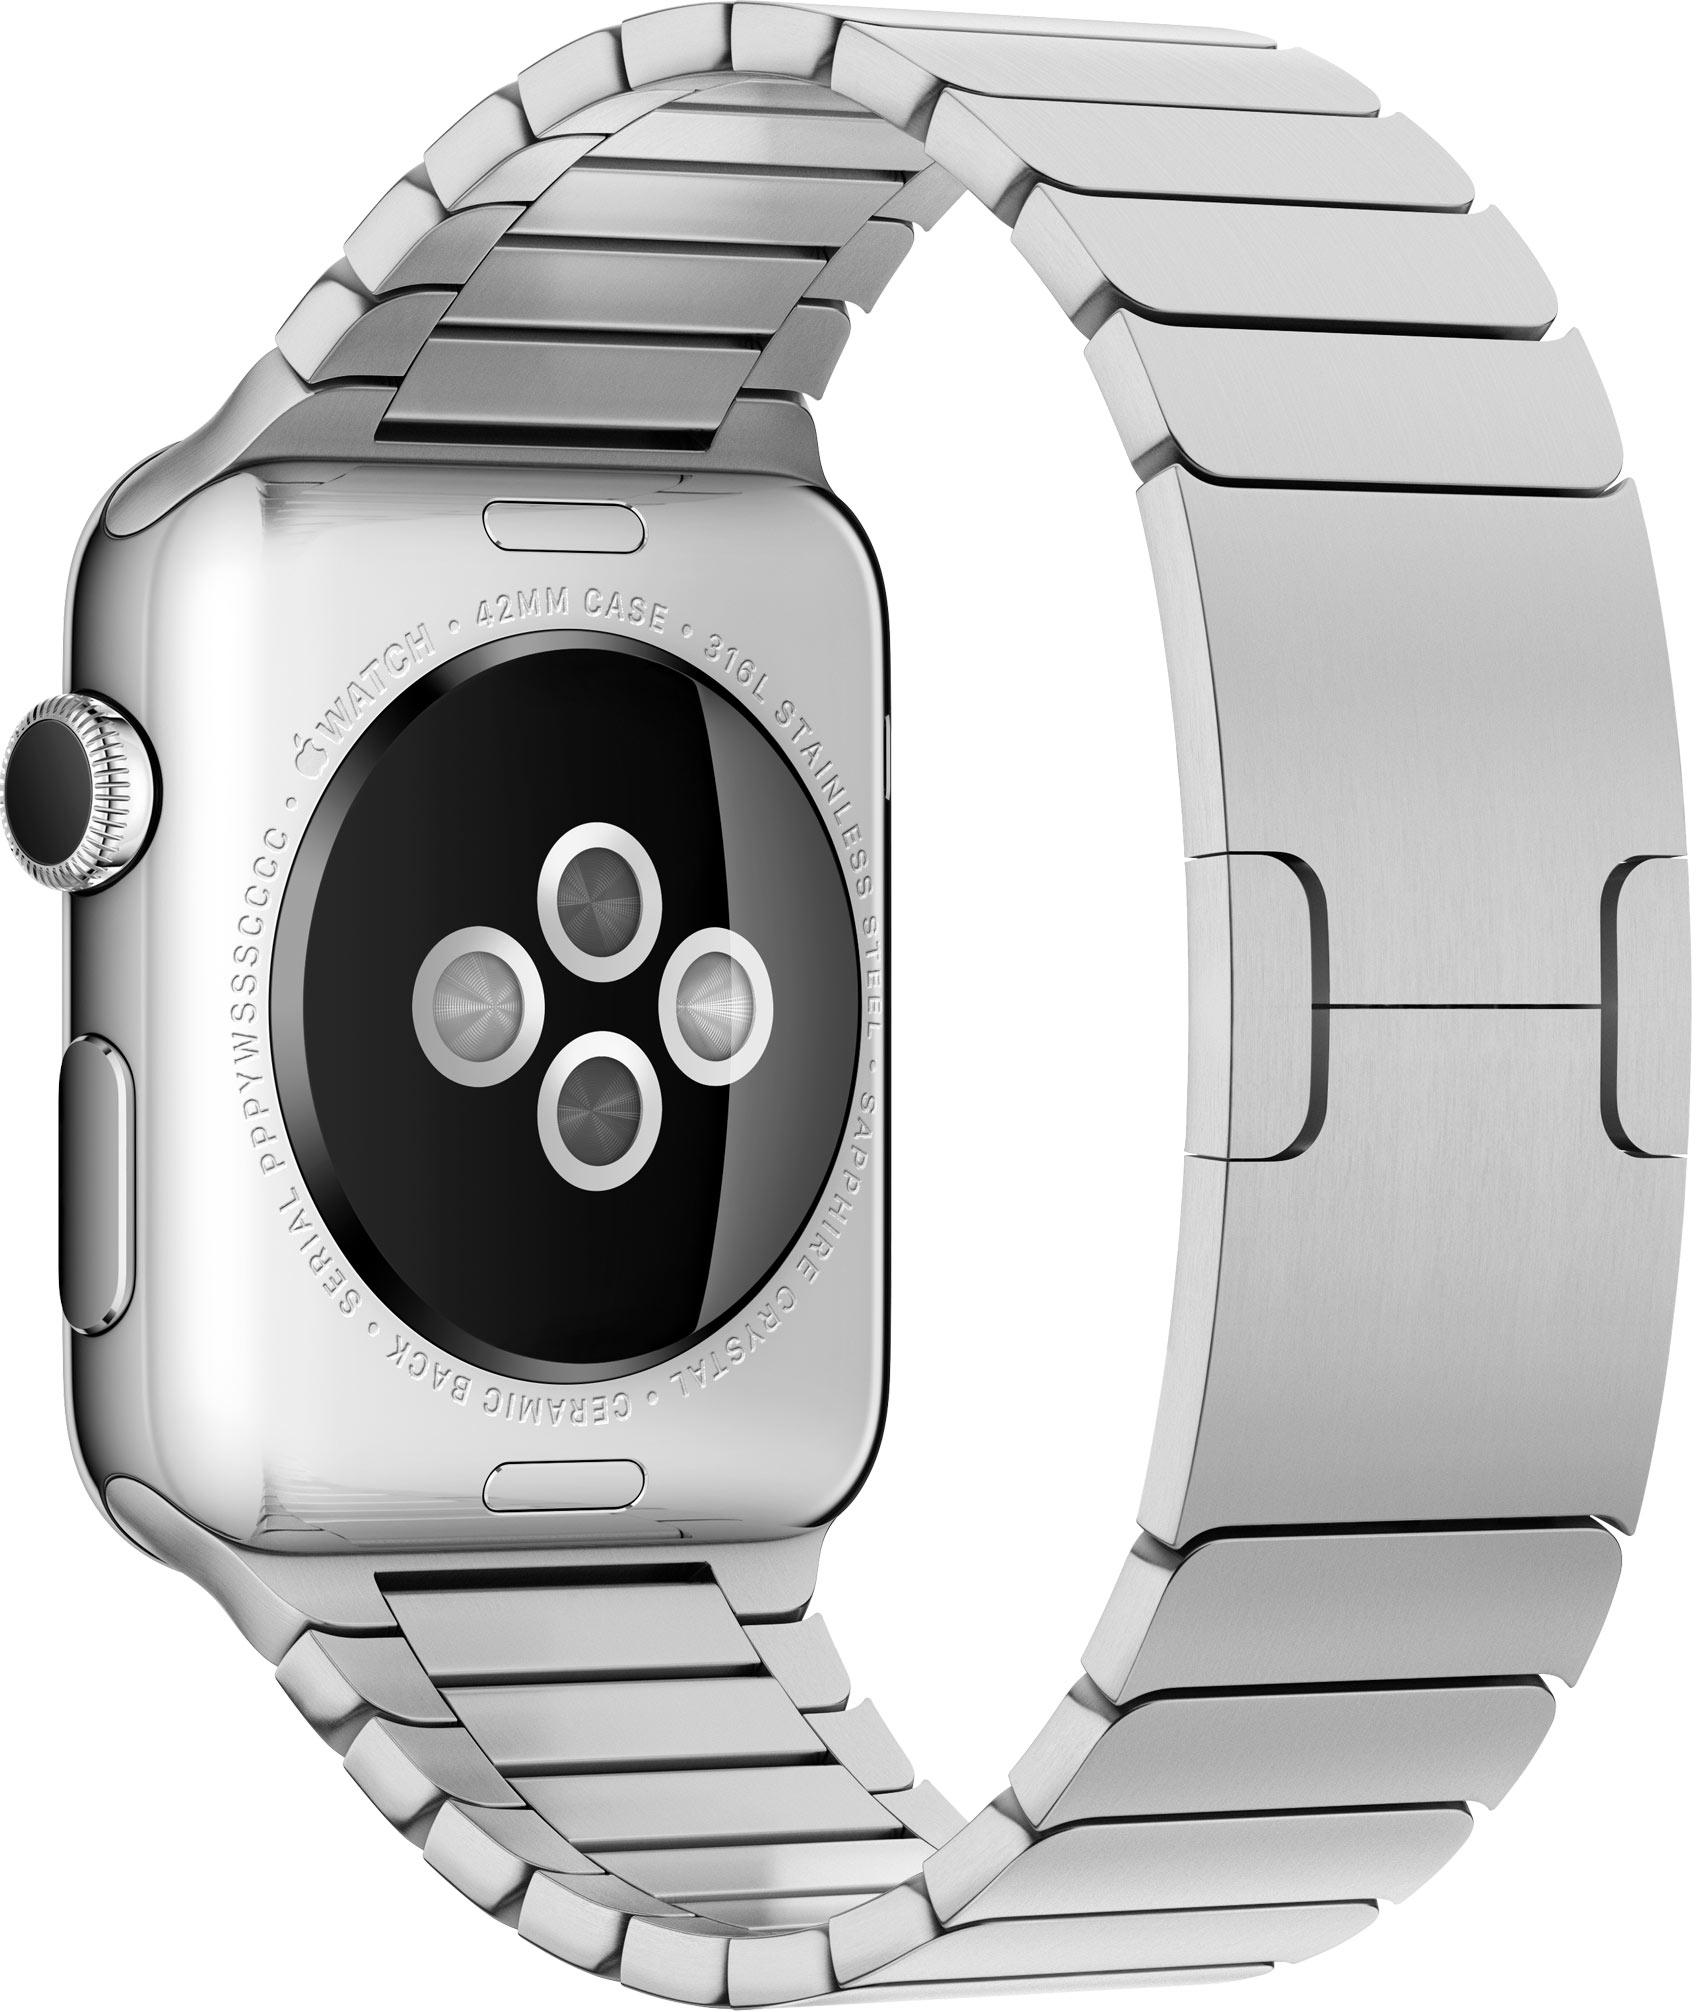 Sensores do Apple Watch